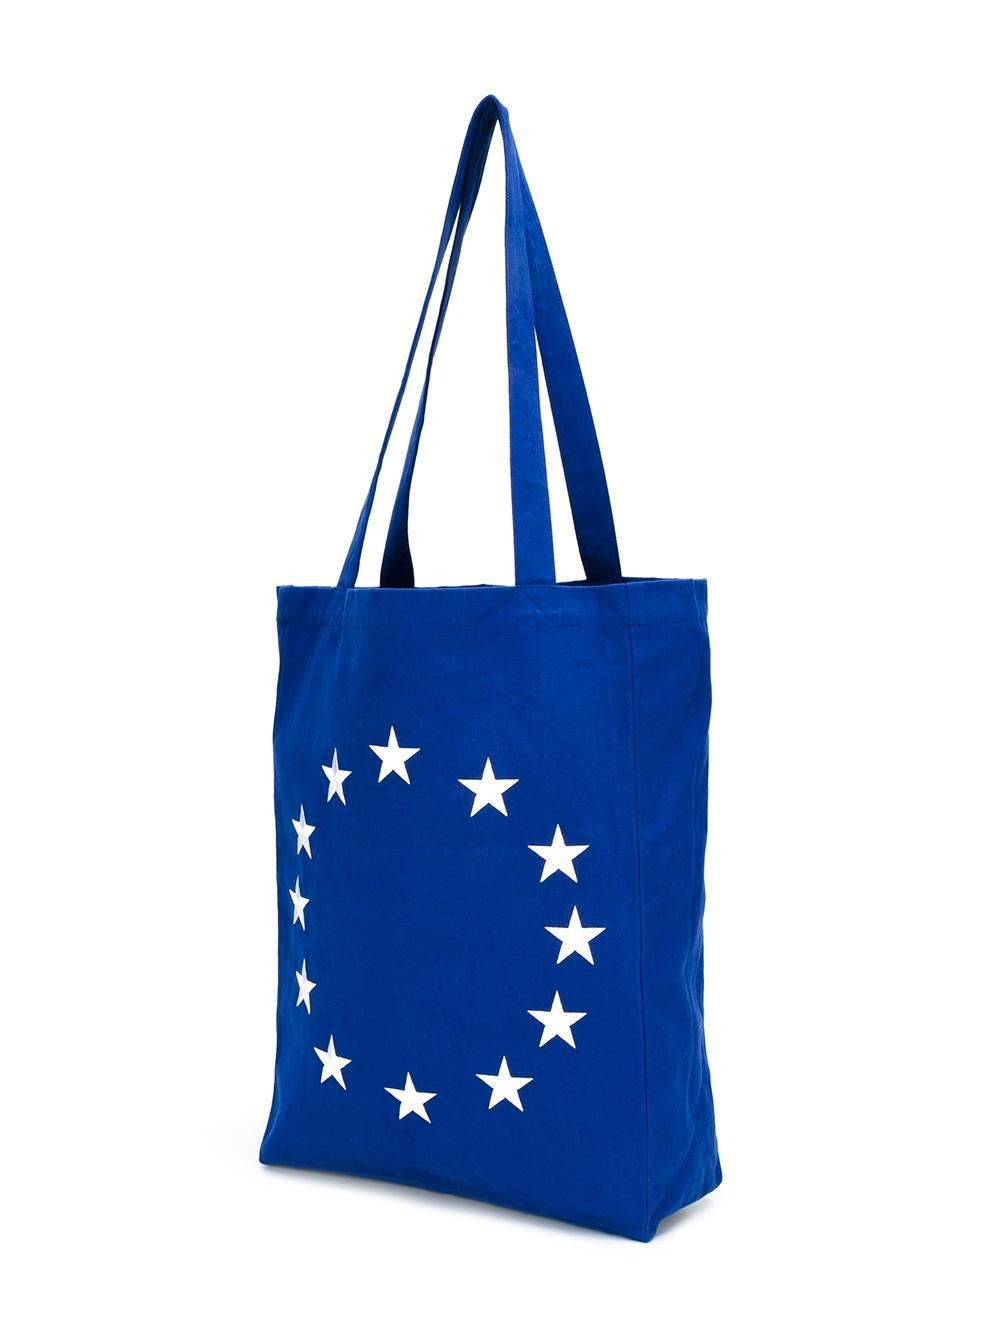 Etudes Studio Cotton Embroidered Star Tote in Blue